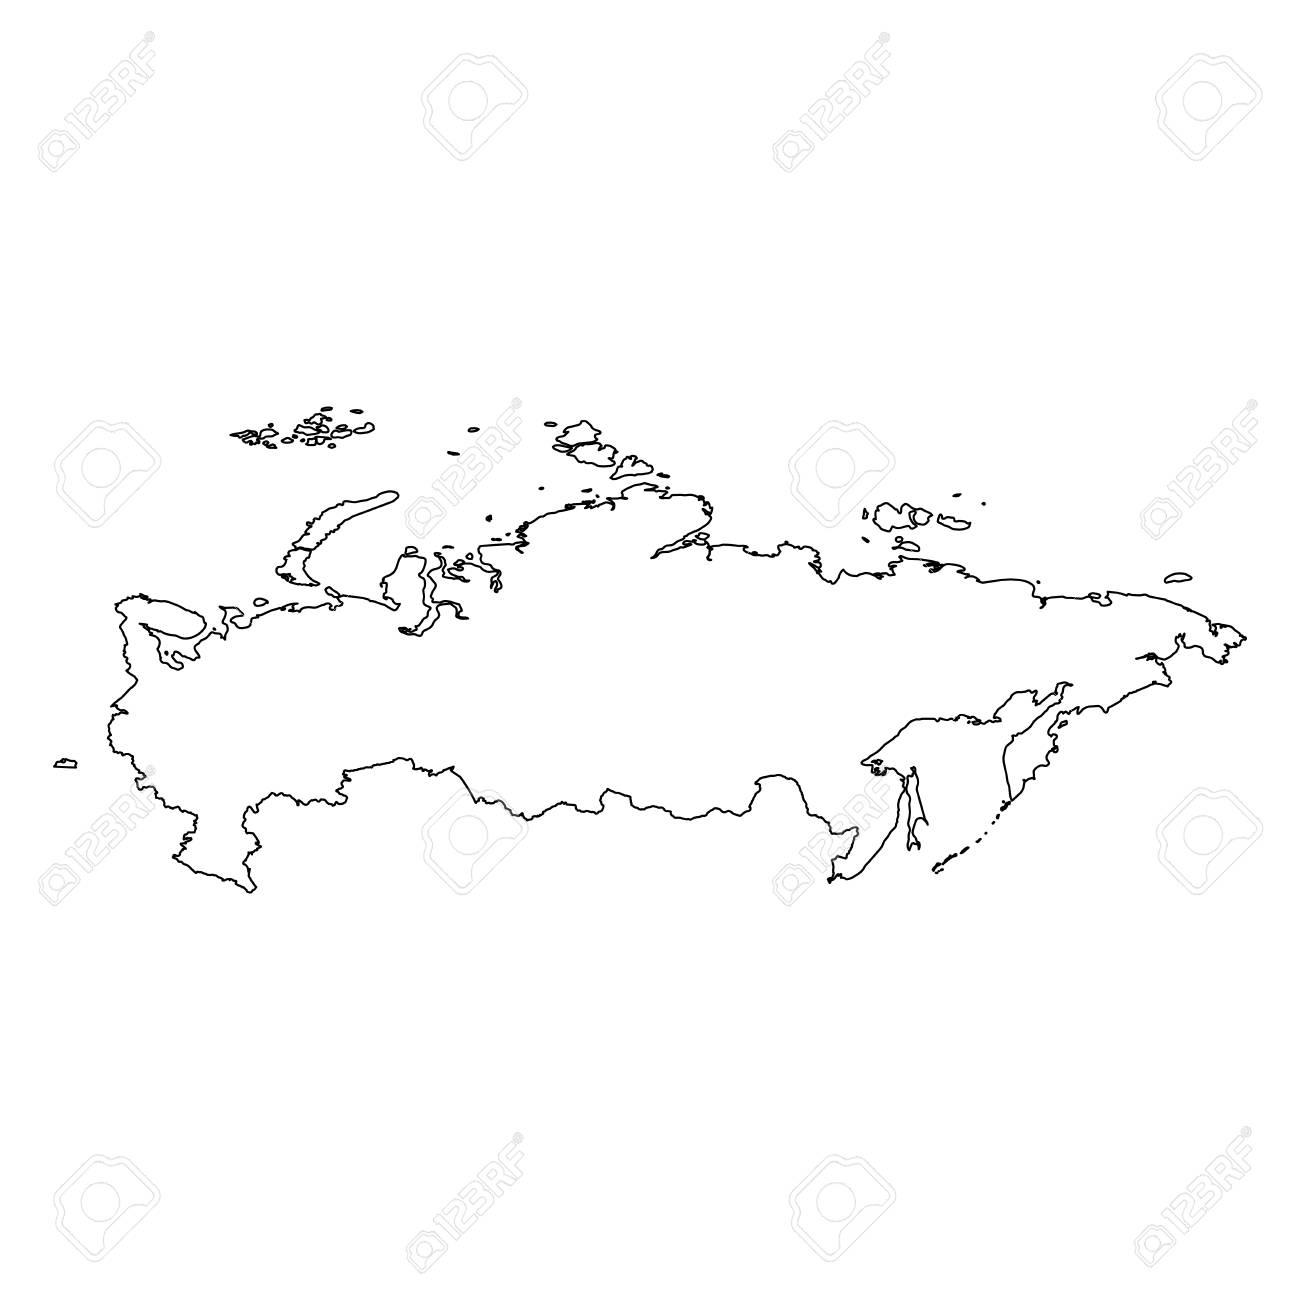 Stock Illustration on flat united states map, flat eurasia map, flat great britain map, flat country map, flat europe map, flat us map, flat africa map, flat world maps,